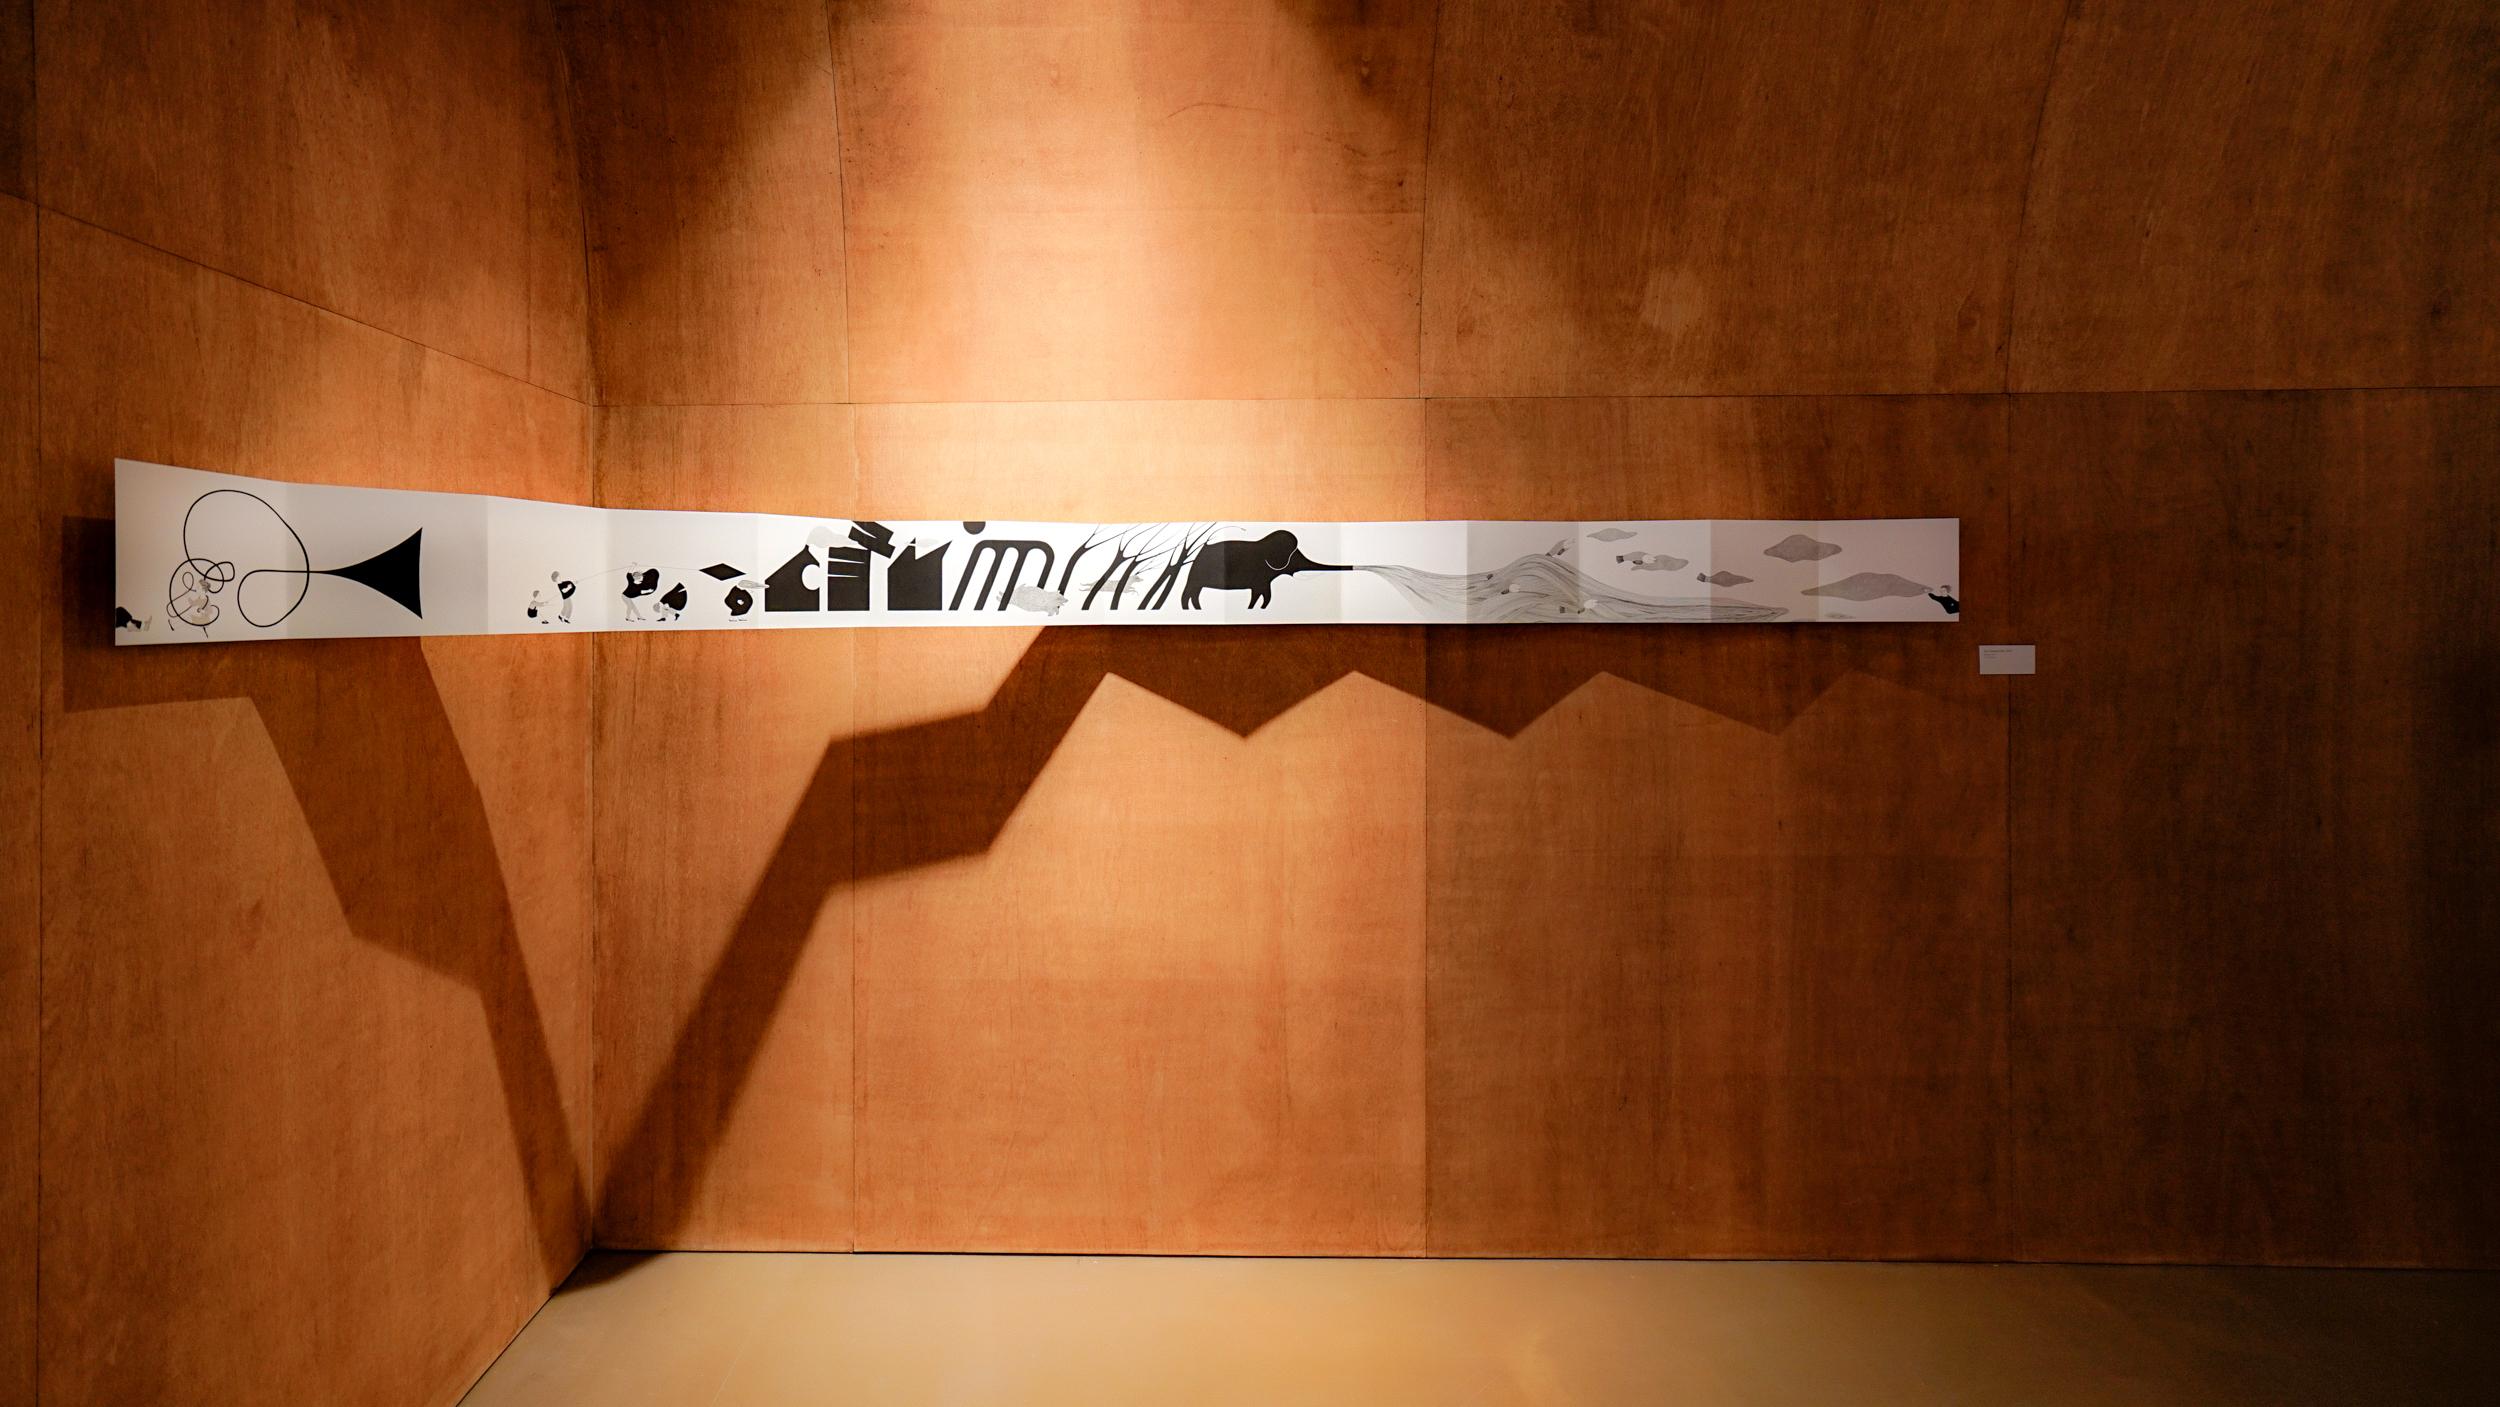 Silent Horizon(Juliette Binet), 2019 courtesy of D MUSEUM